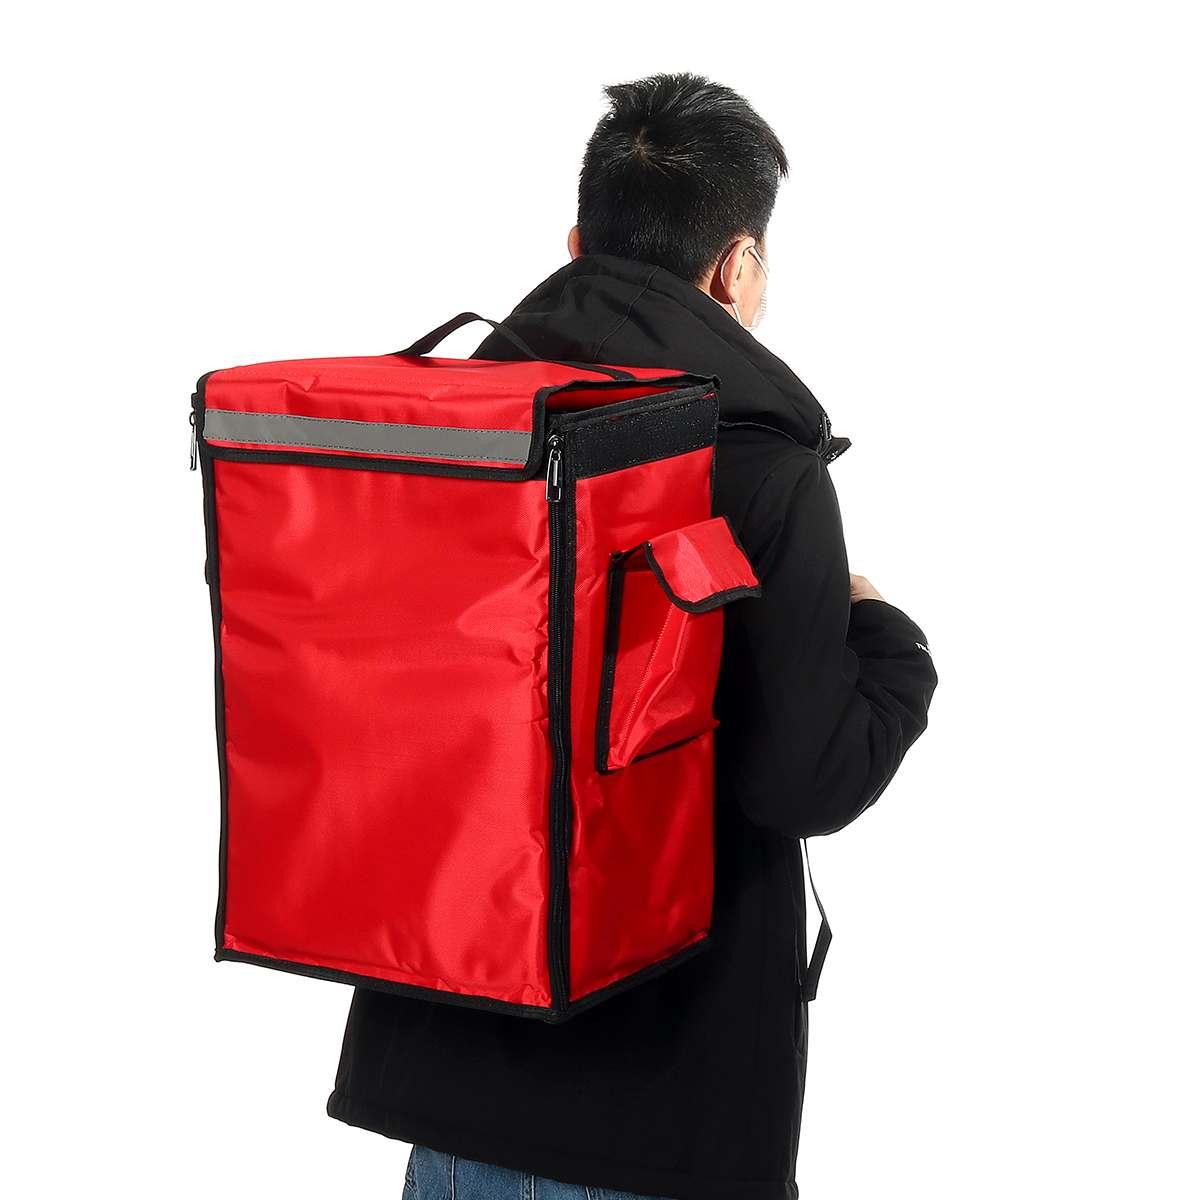 42l saco isolado térmico portátil pizza entrega de alimentos saco de armazenamento piquenique scooter mochila cooler sacos dobrável pacote isolamento